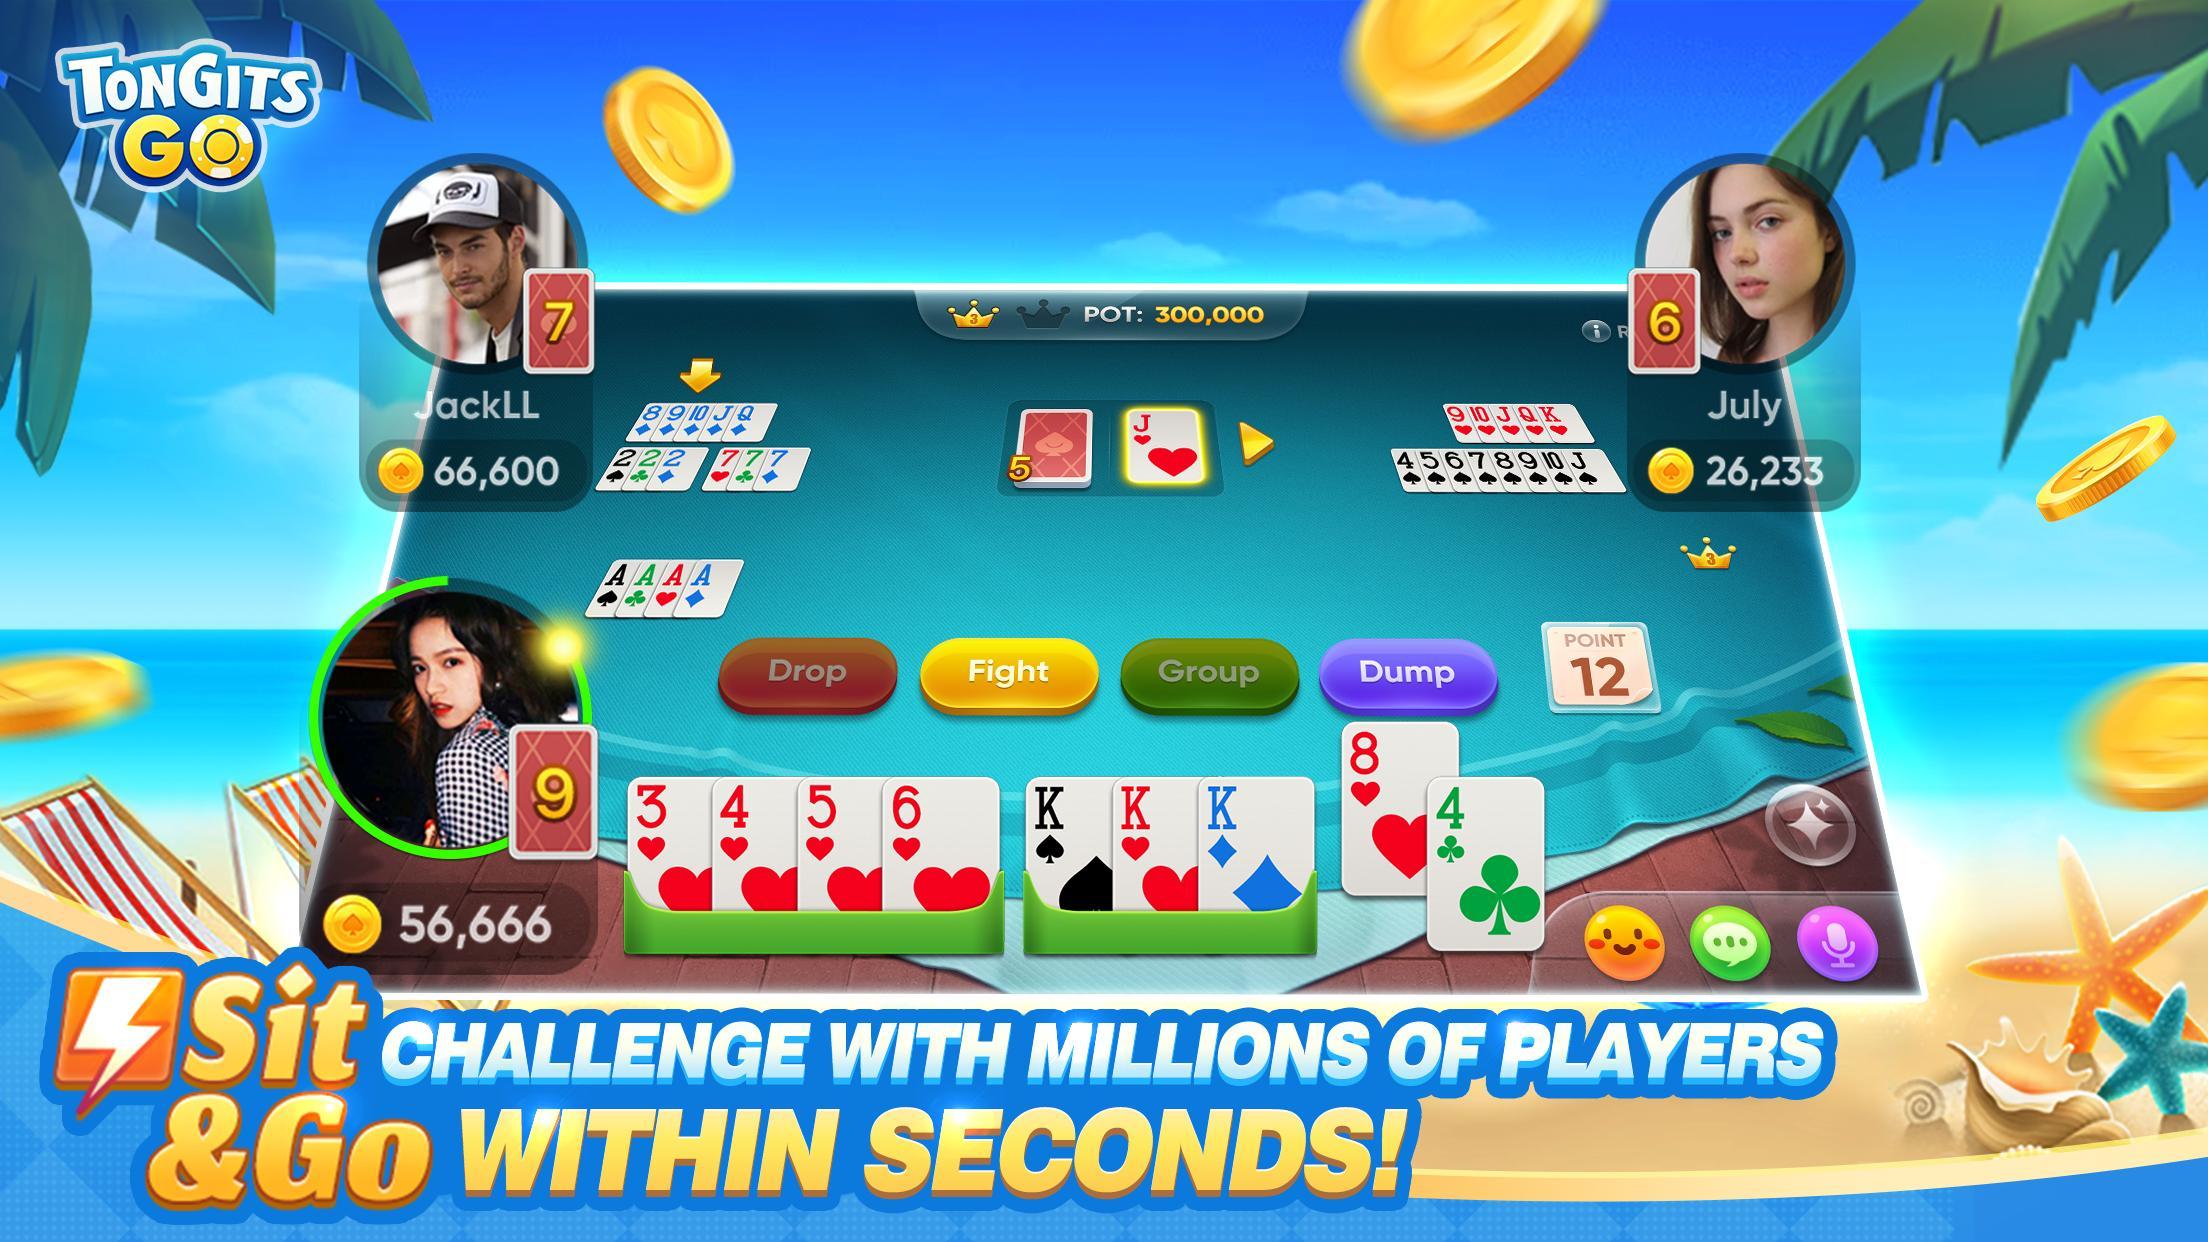 Tongits Go The Best Card Game Online 2.9.16 Screenshot 3